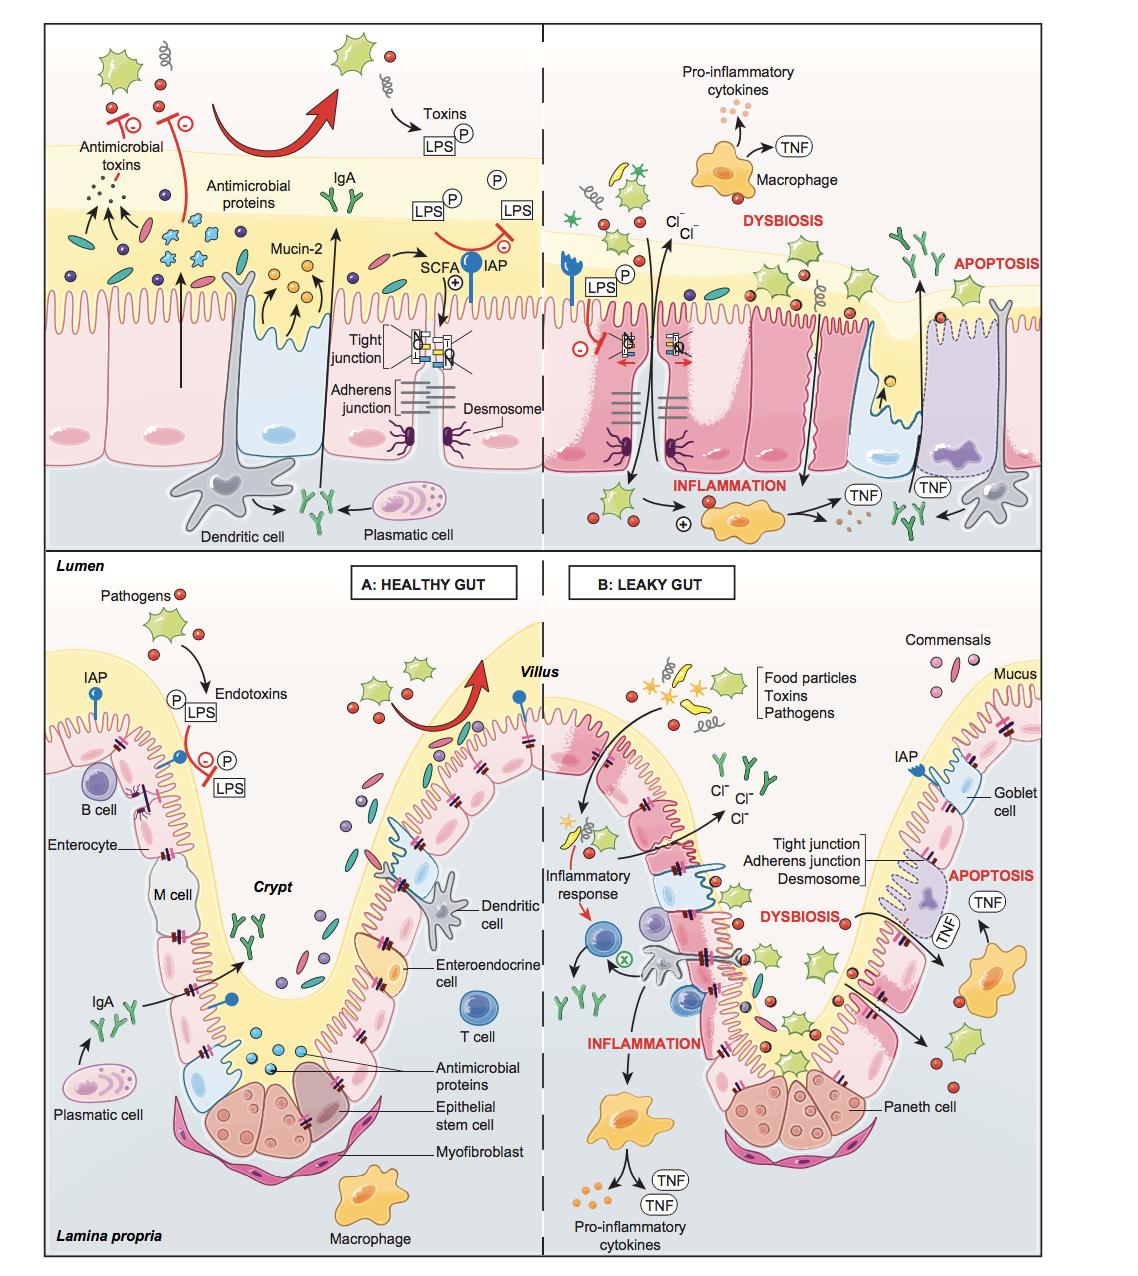 probiotics for SIBO probiotics for small intestinal bacterial overgrowth SIBO treatment with probiotics lactobacilli and SIBO bifidobacterium and SIBO spore based probiotics and SIBO